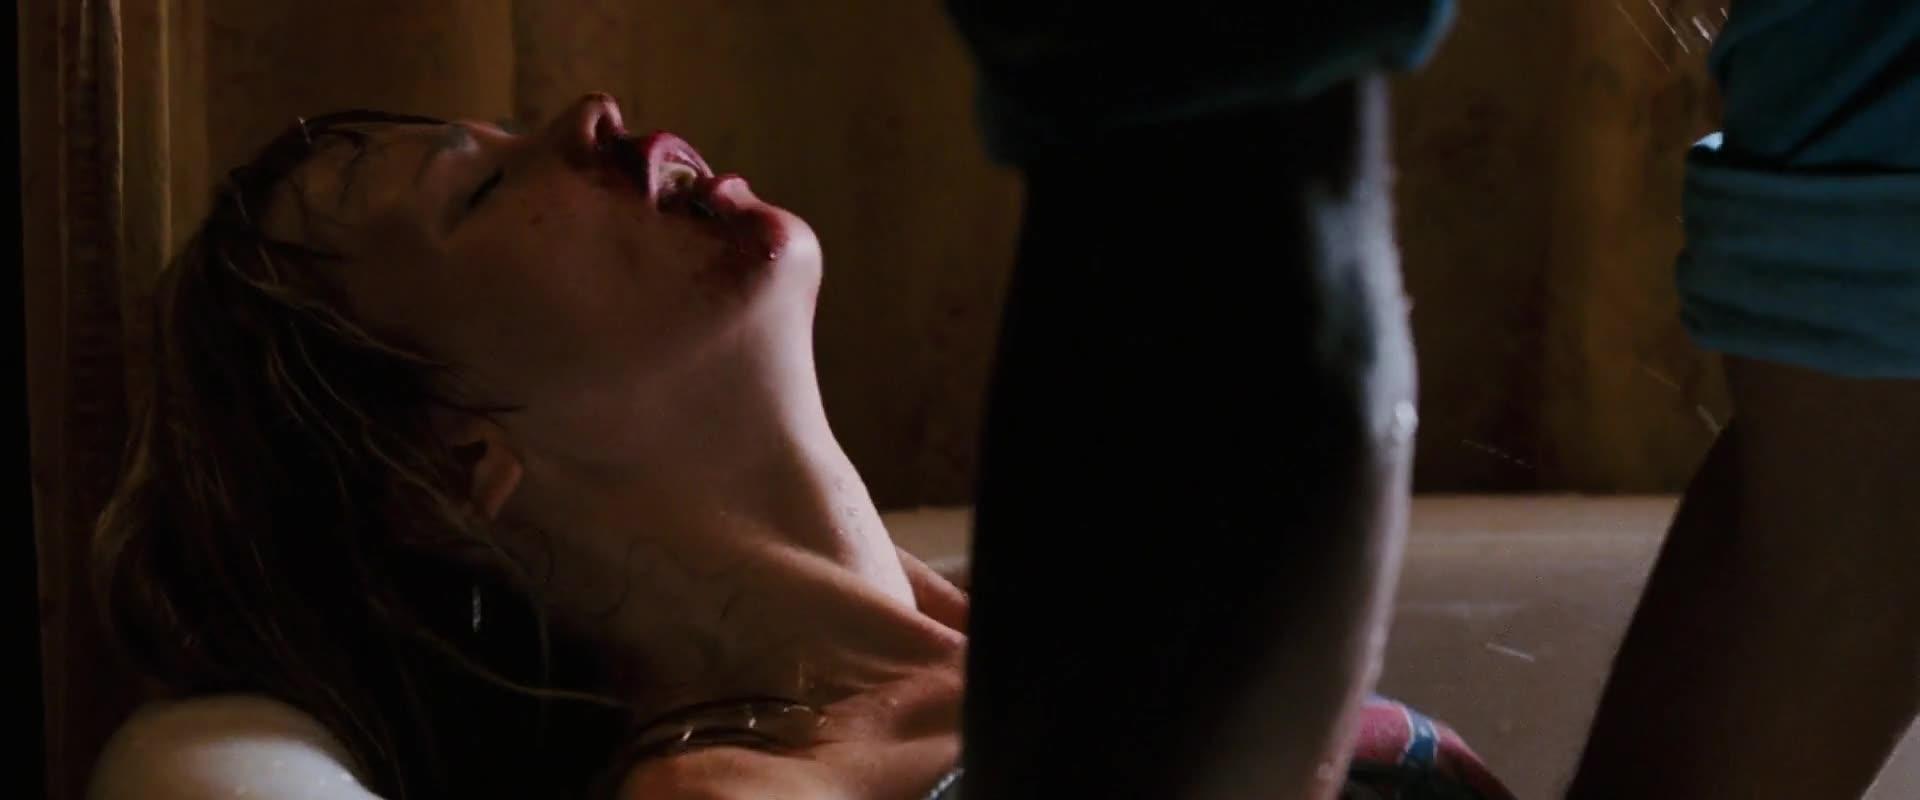 Christina Ricci sexy scene from Black Snake Moan